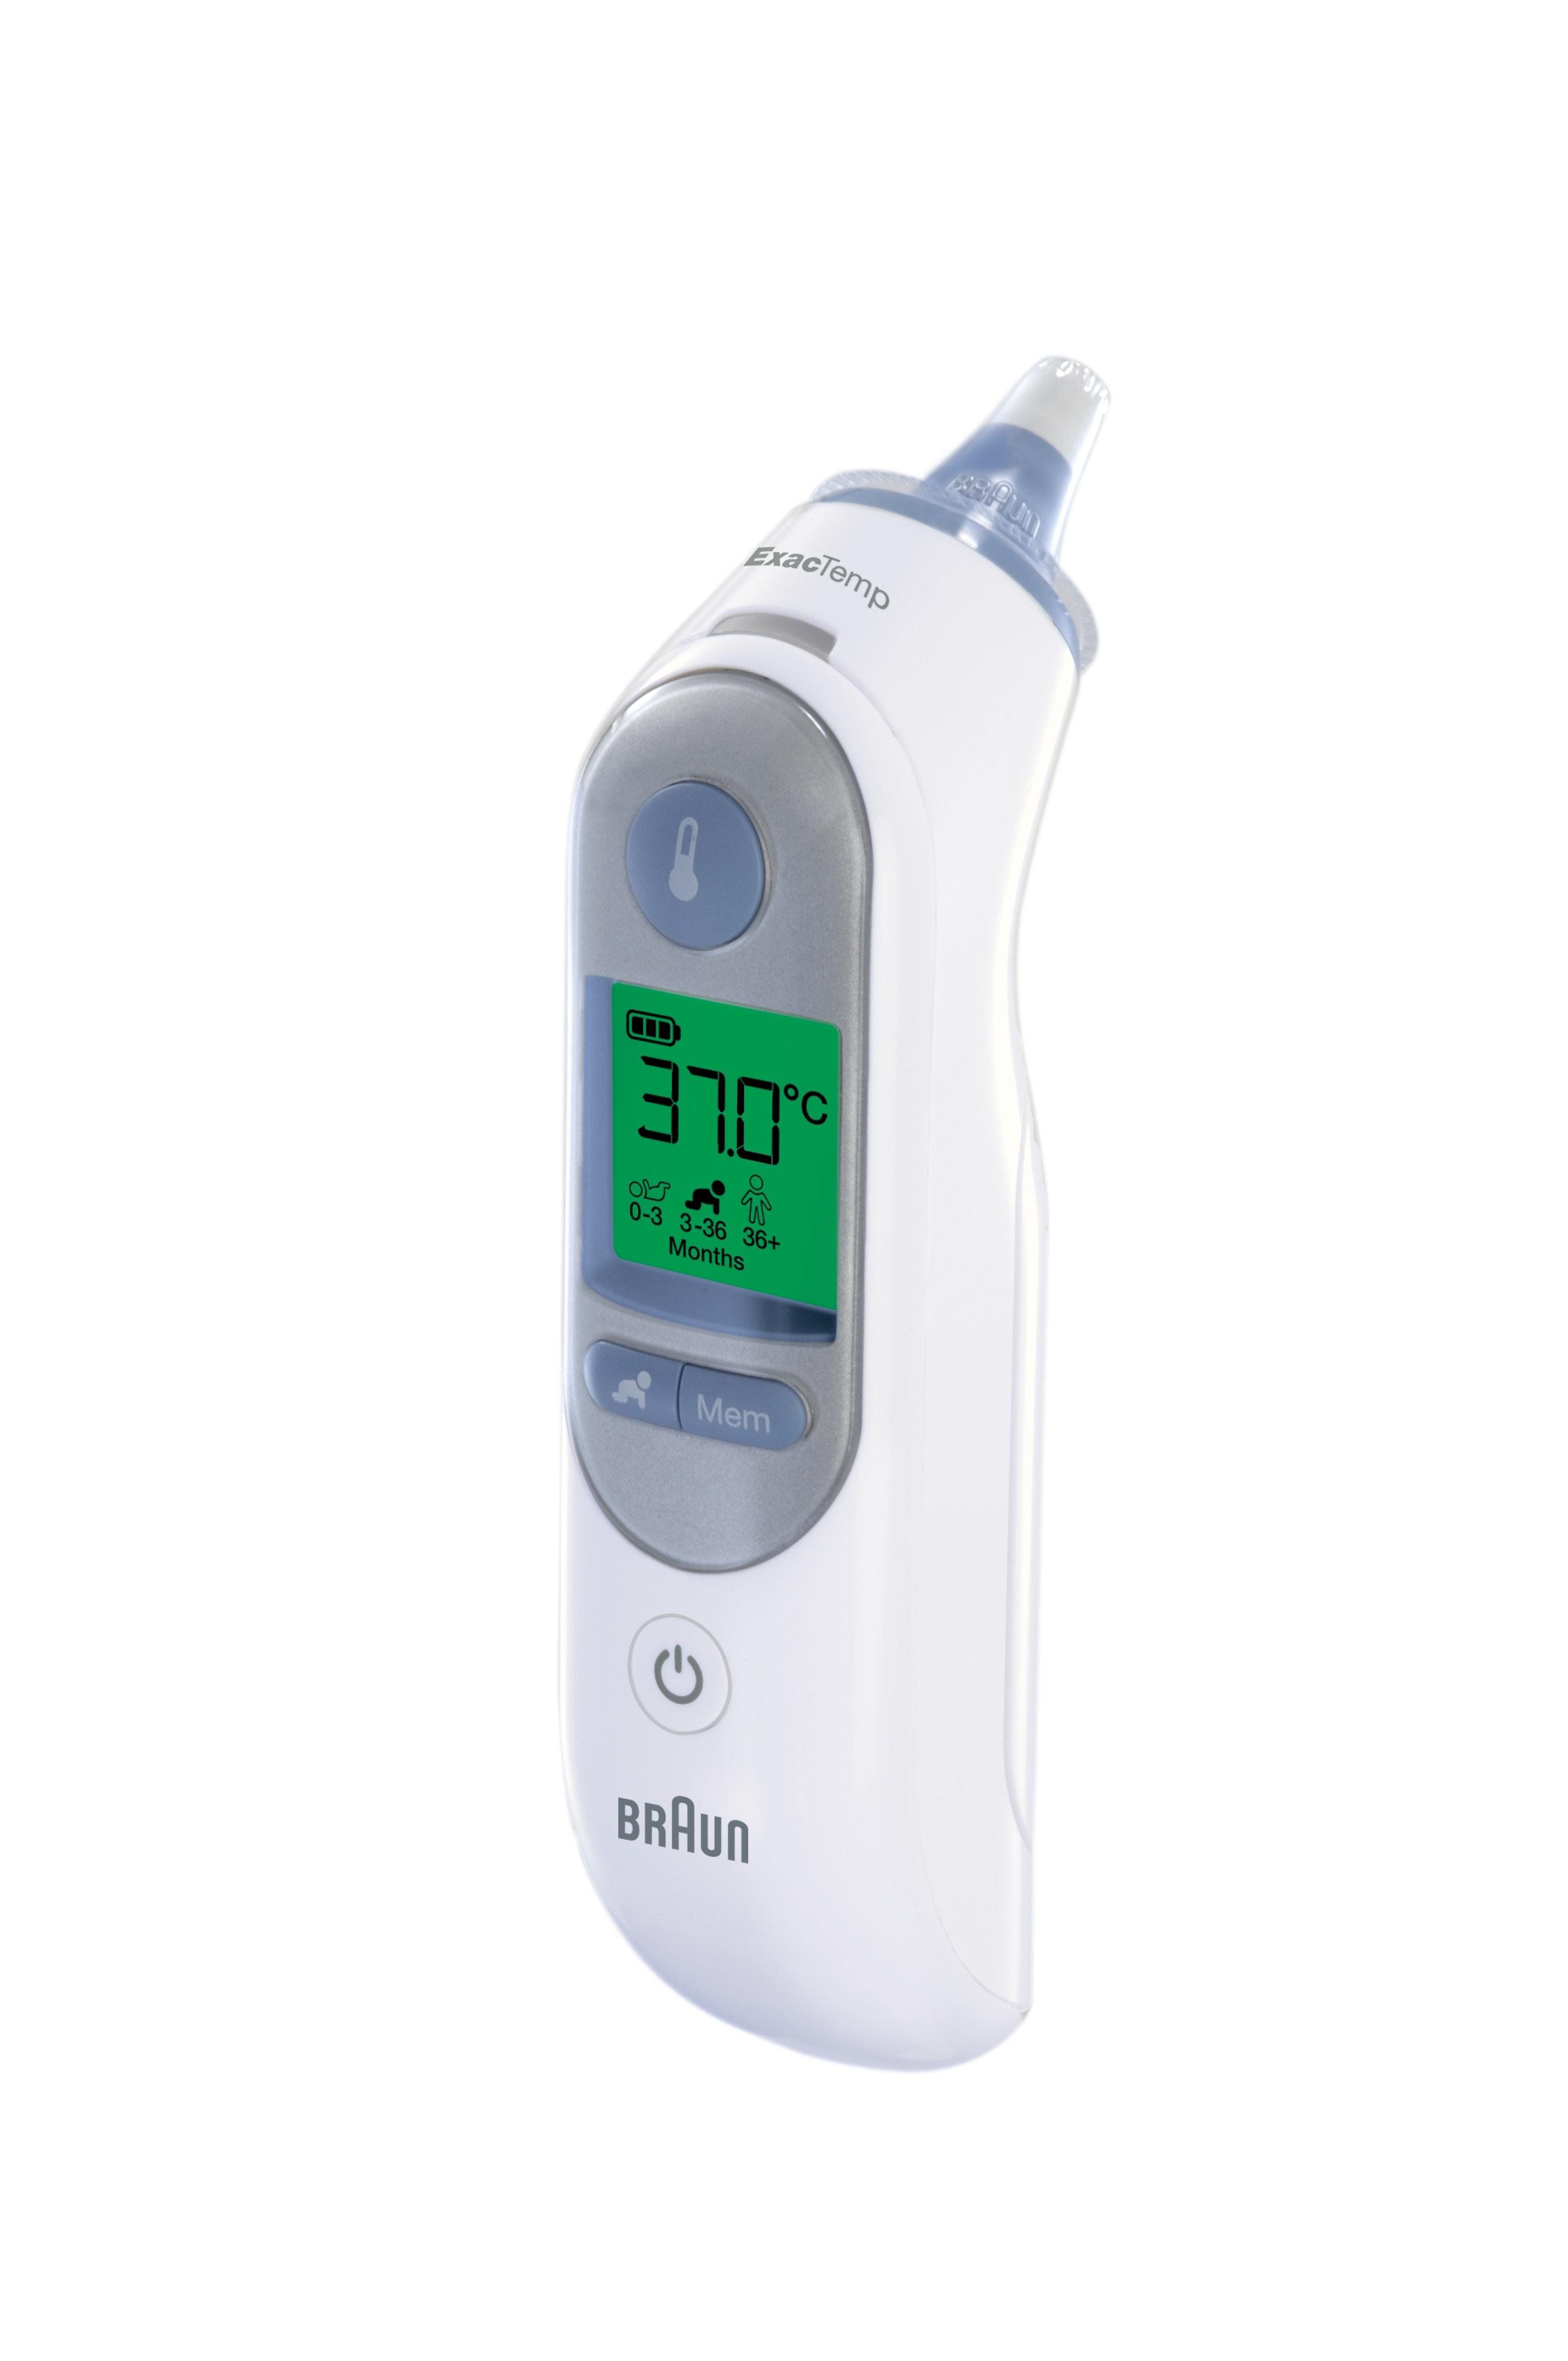 Braun Thermoscan 7Series sweepstakes